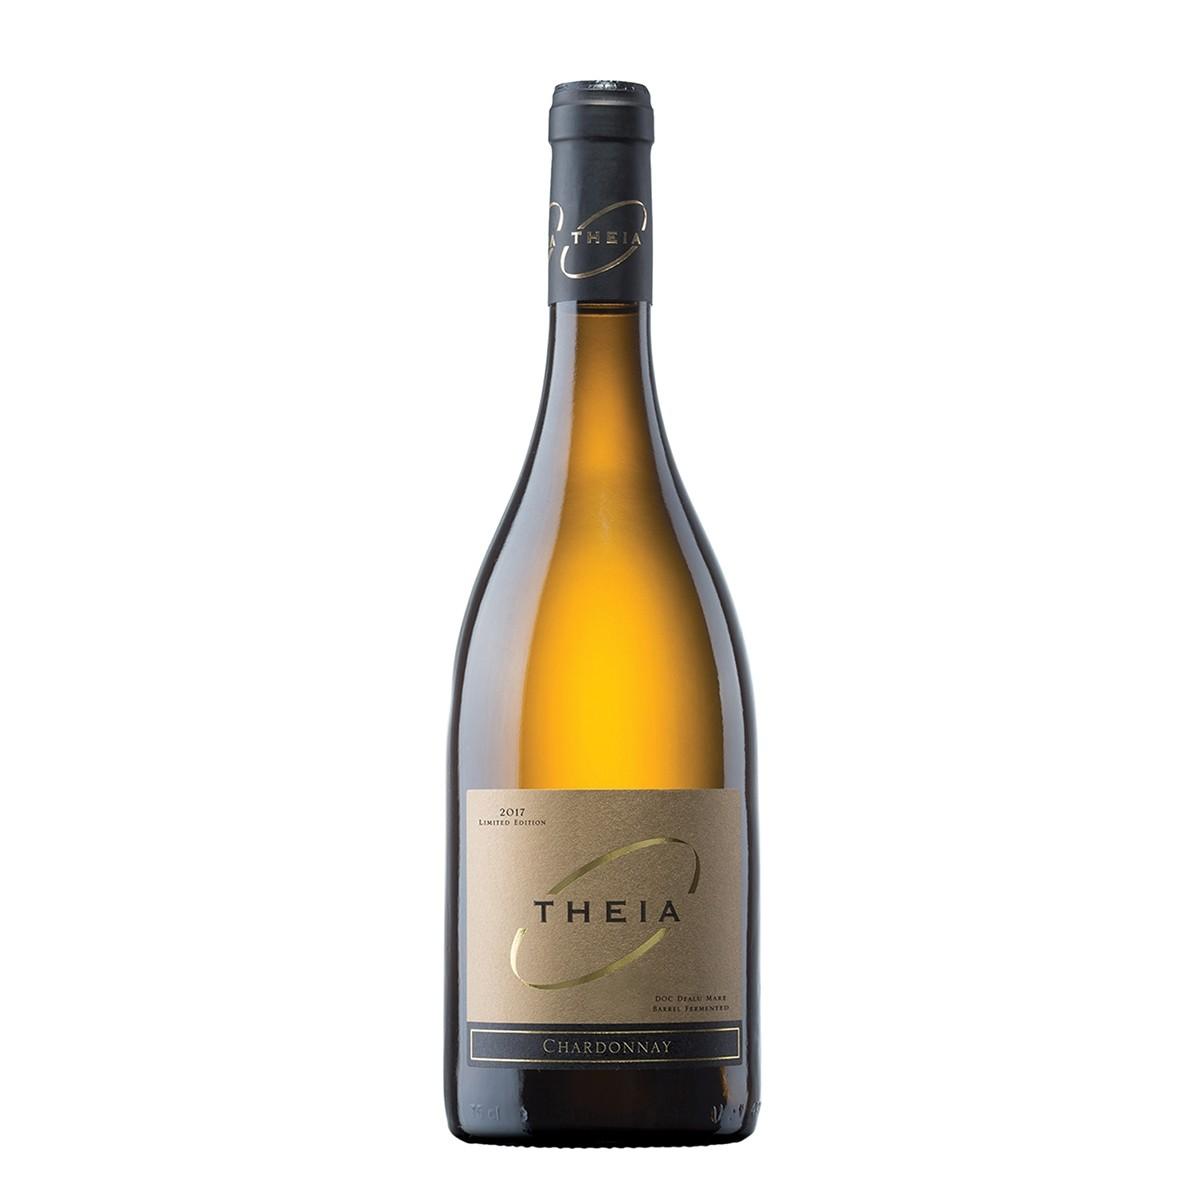 Theia Chardonnay 2017